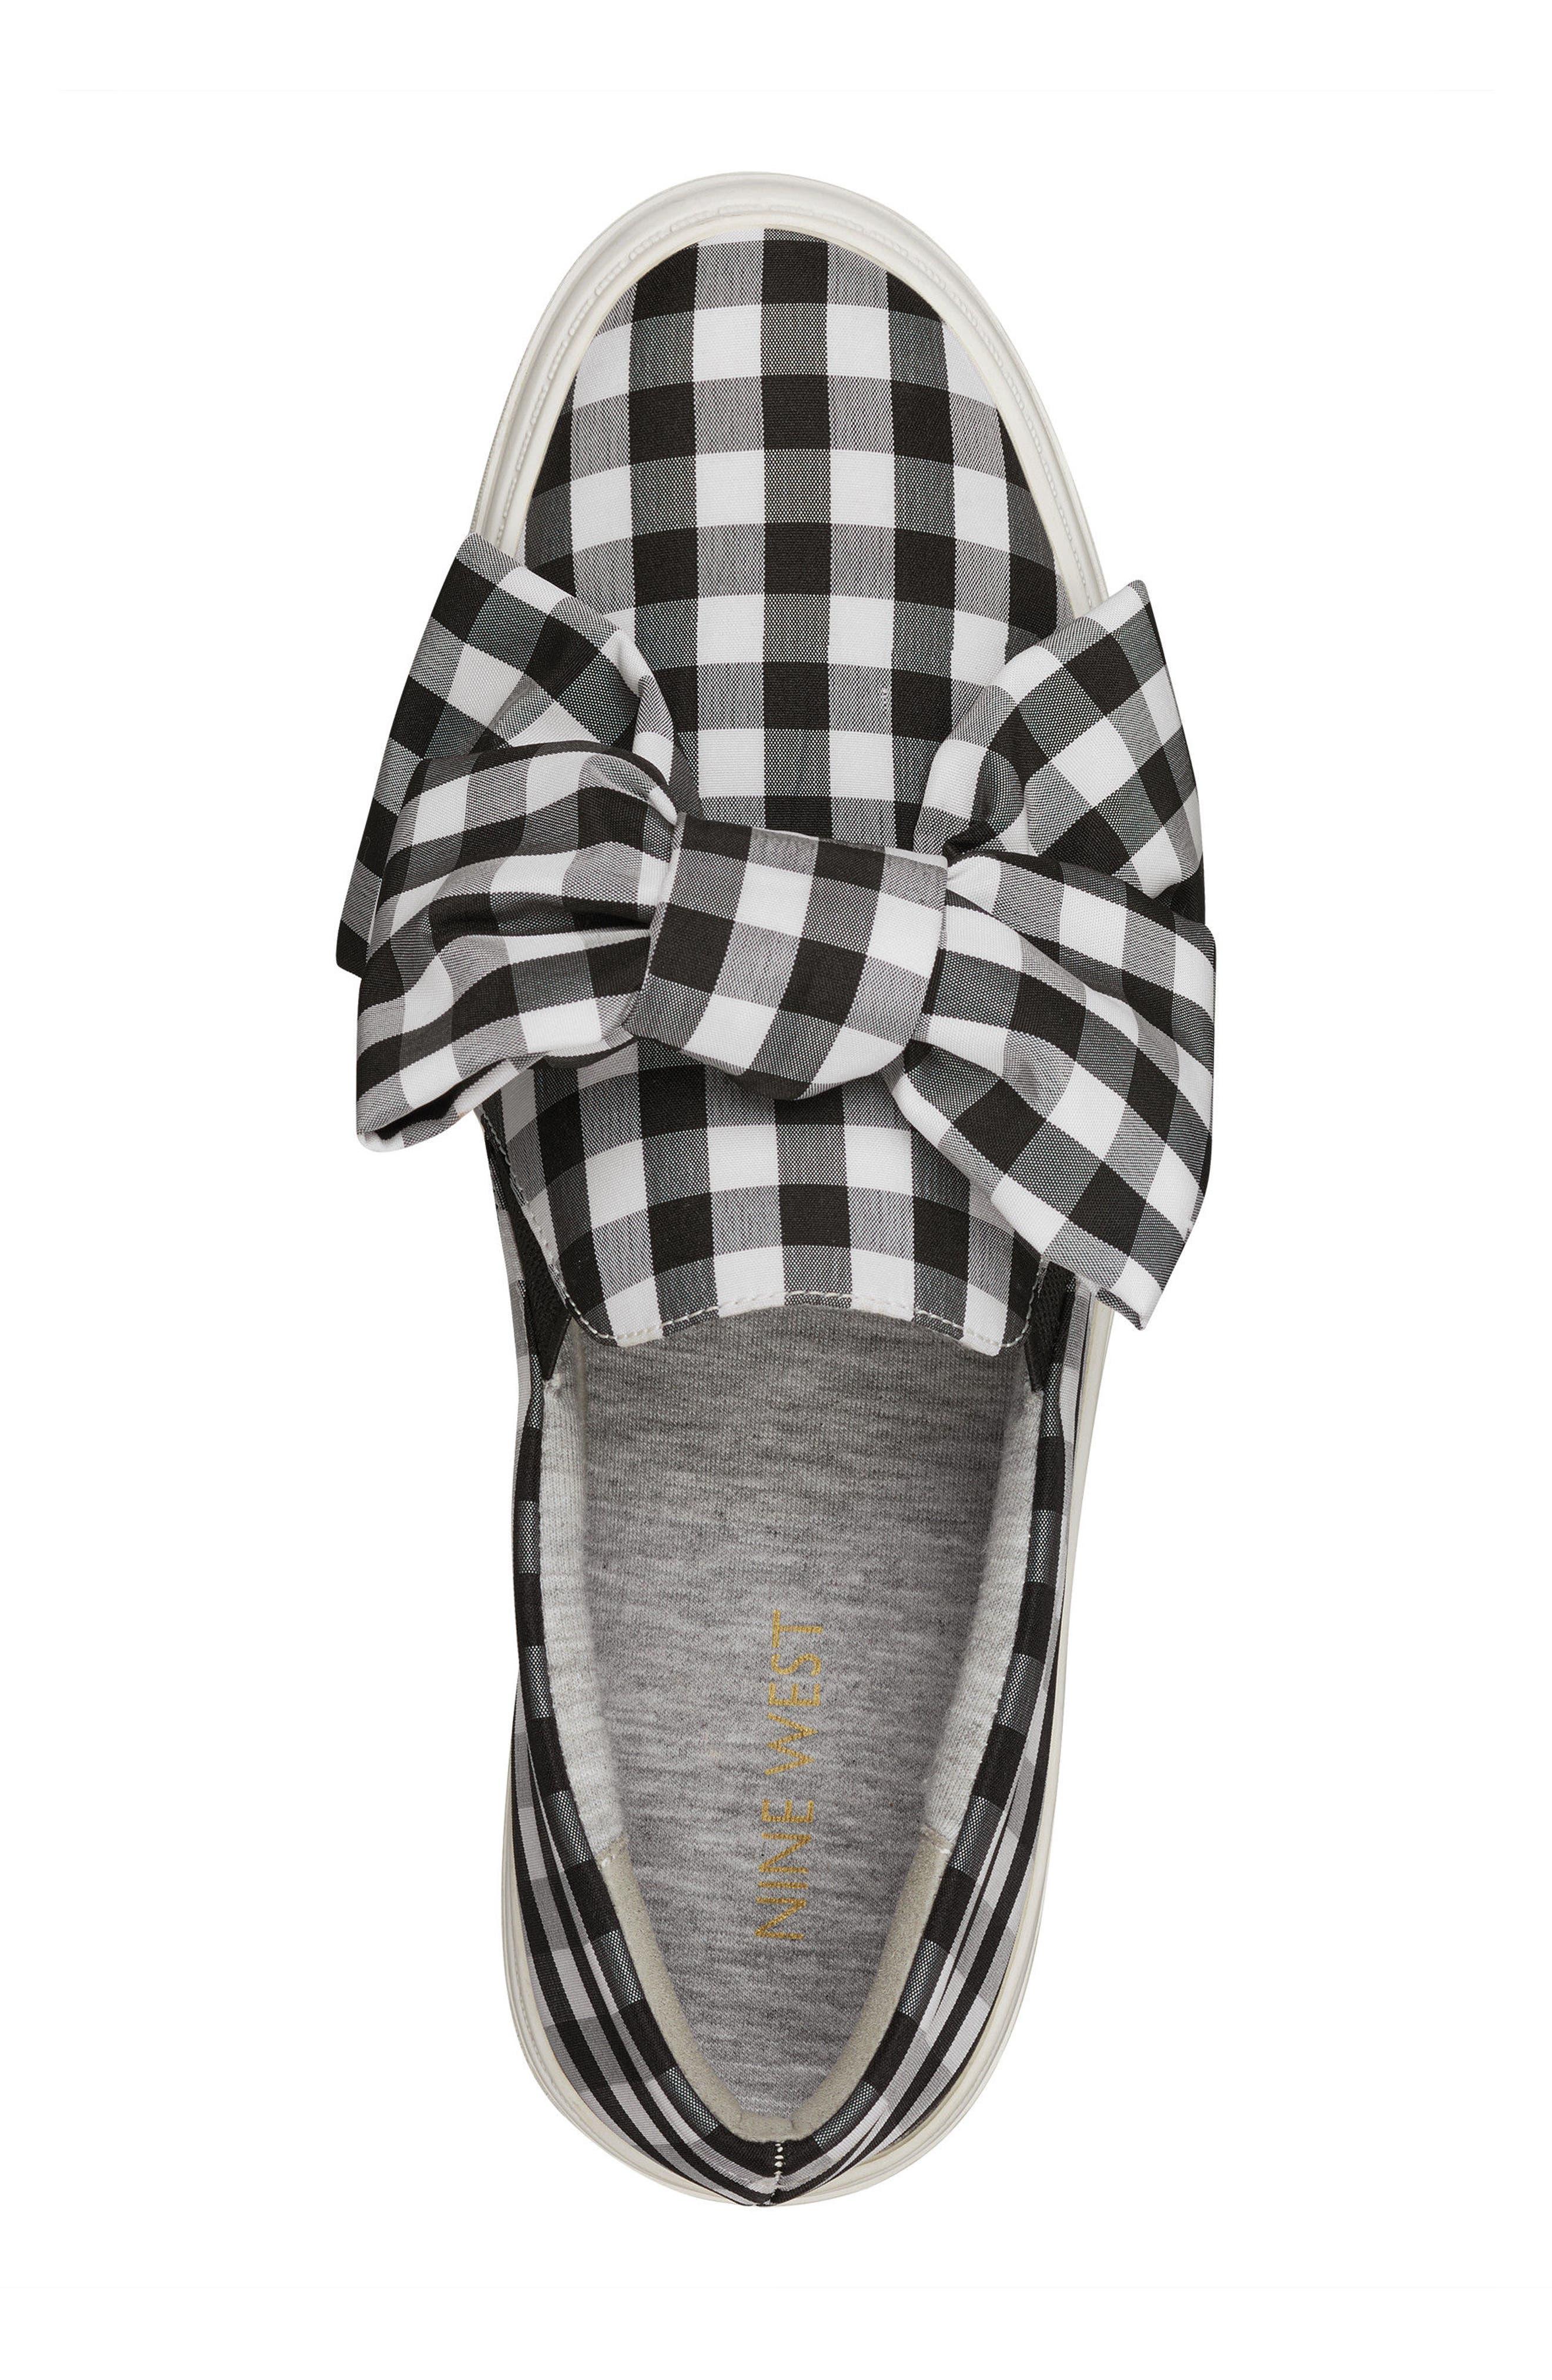 Onosha Bow Slip-On Sneaker,                             Alternate thumbnail 5, color,                             Black/ White Fabric